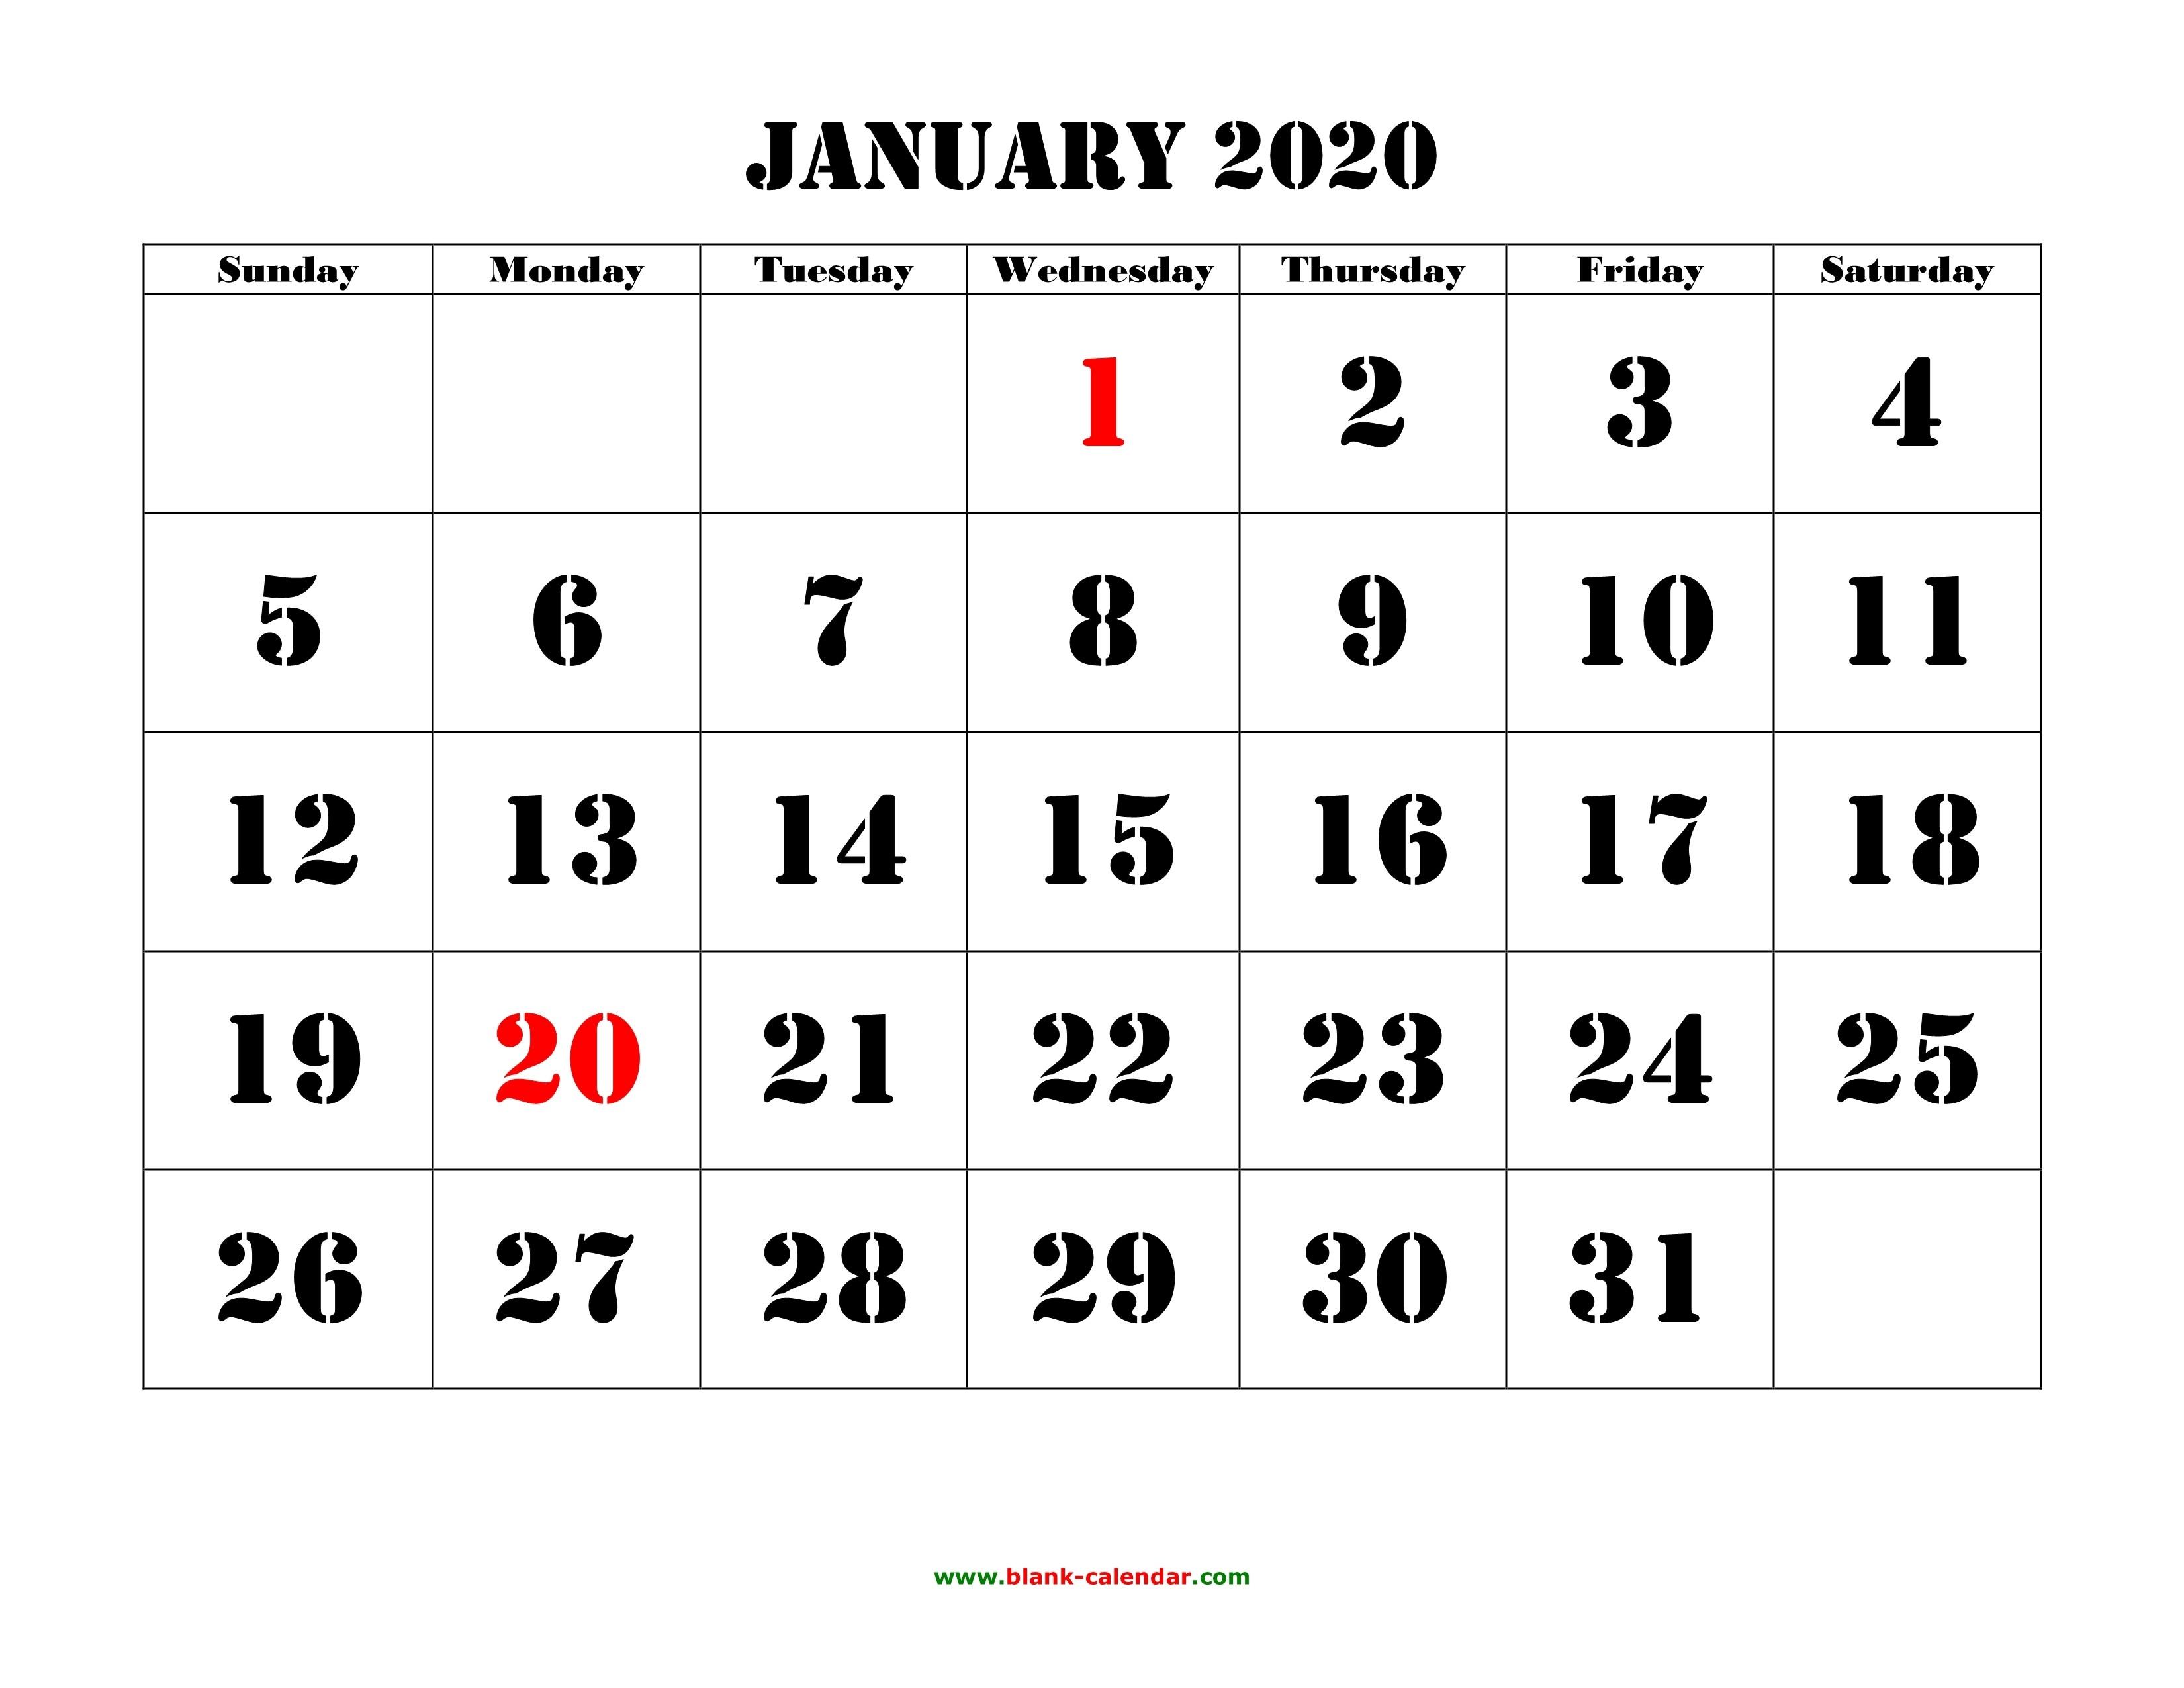 Printable January 2020 Calendar - Free Blank Templates-January 2020 Calendar With Holidays Printable